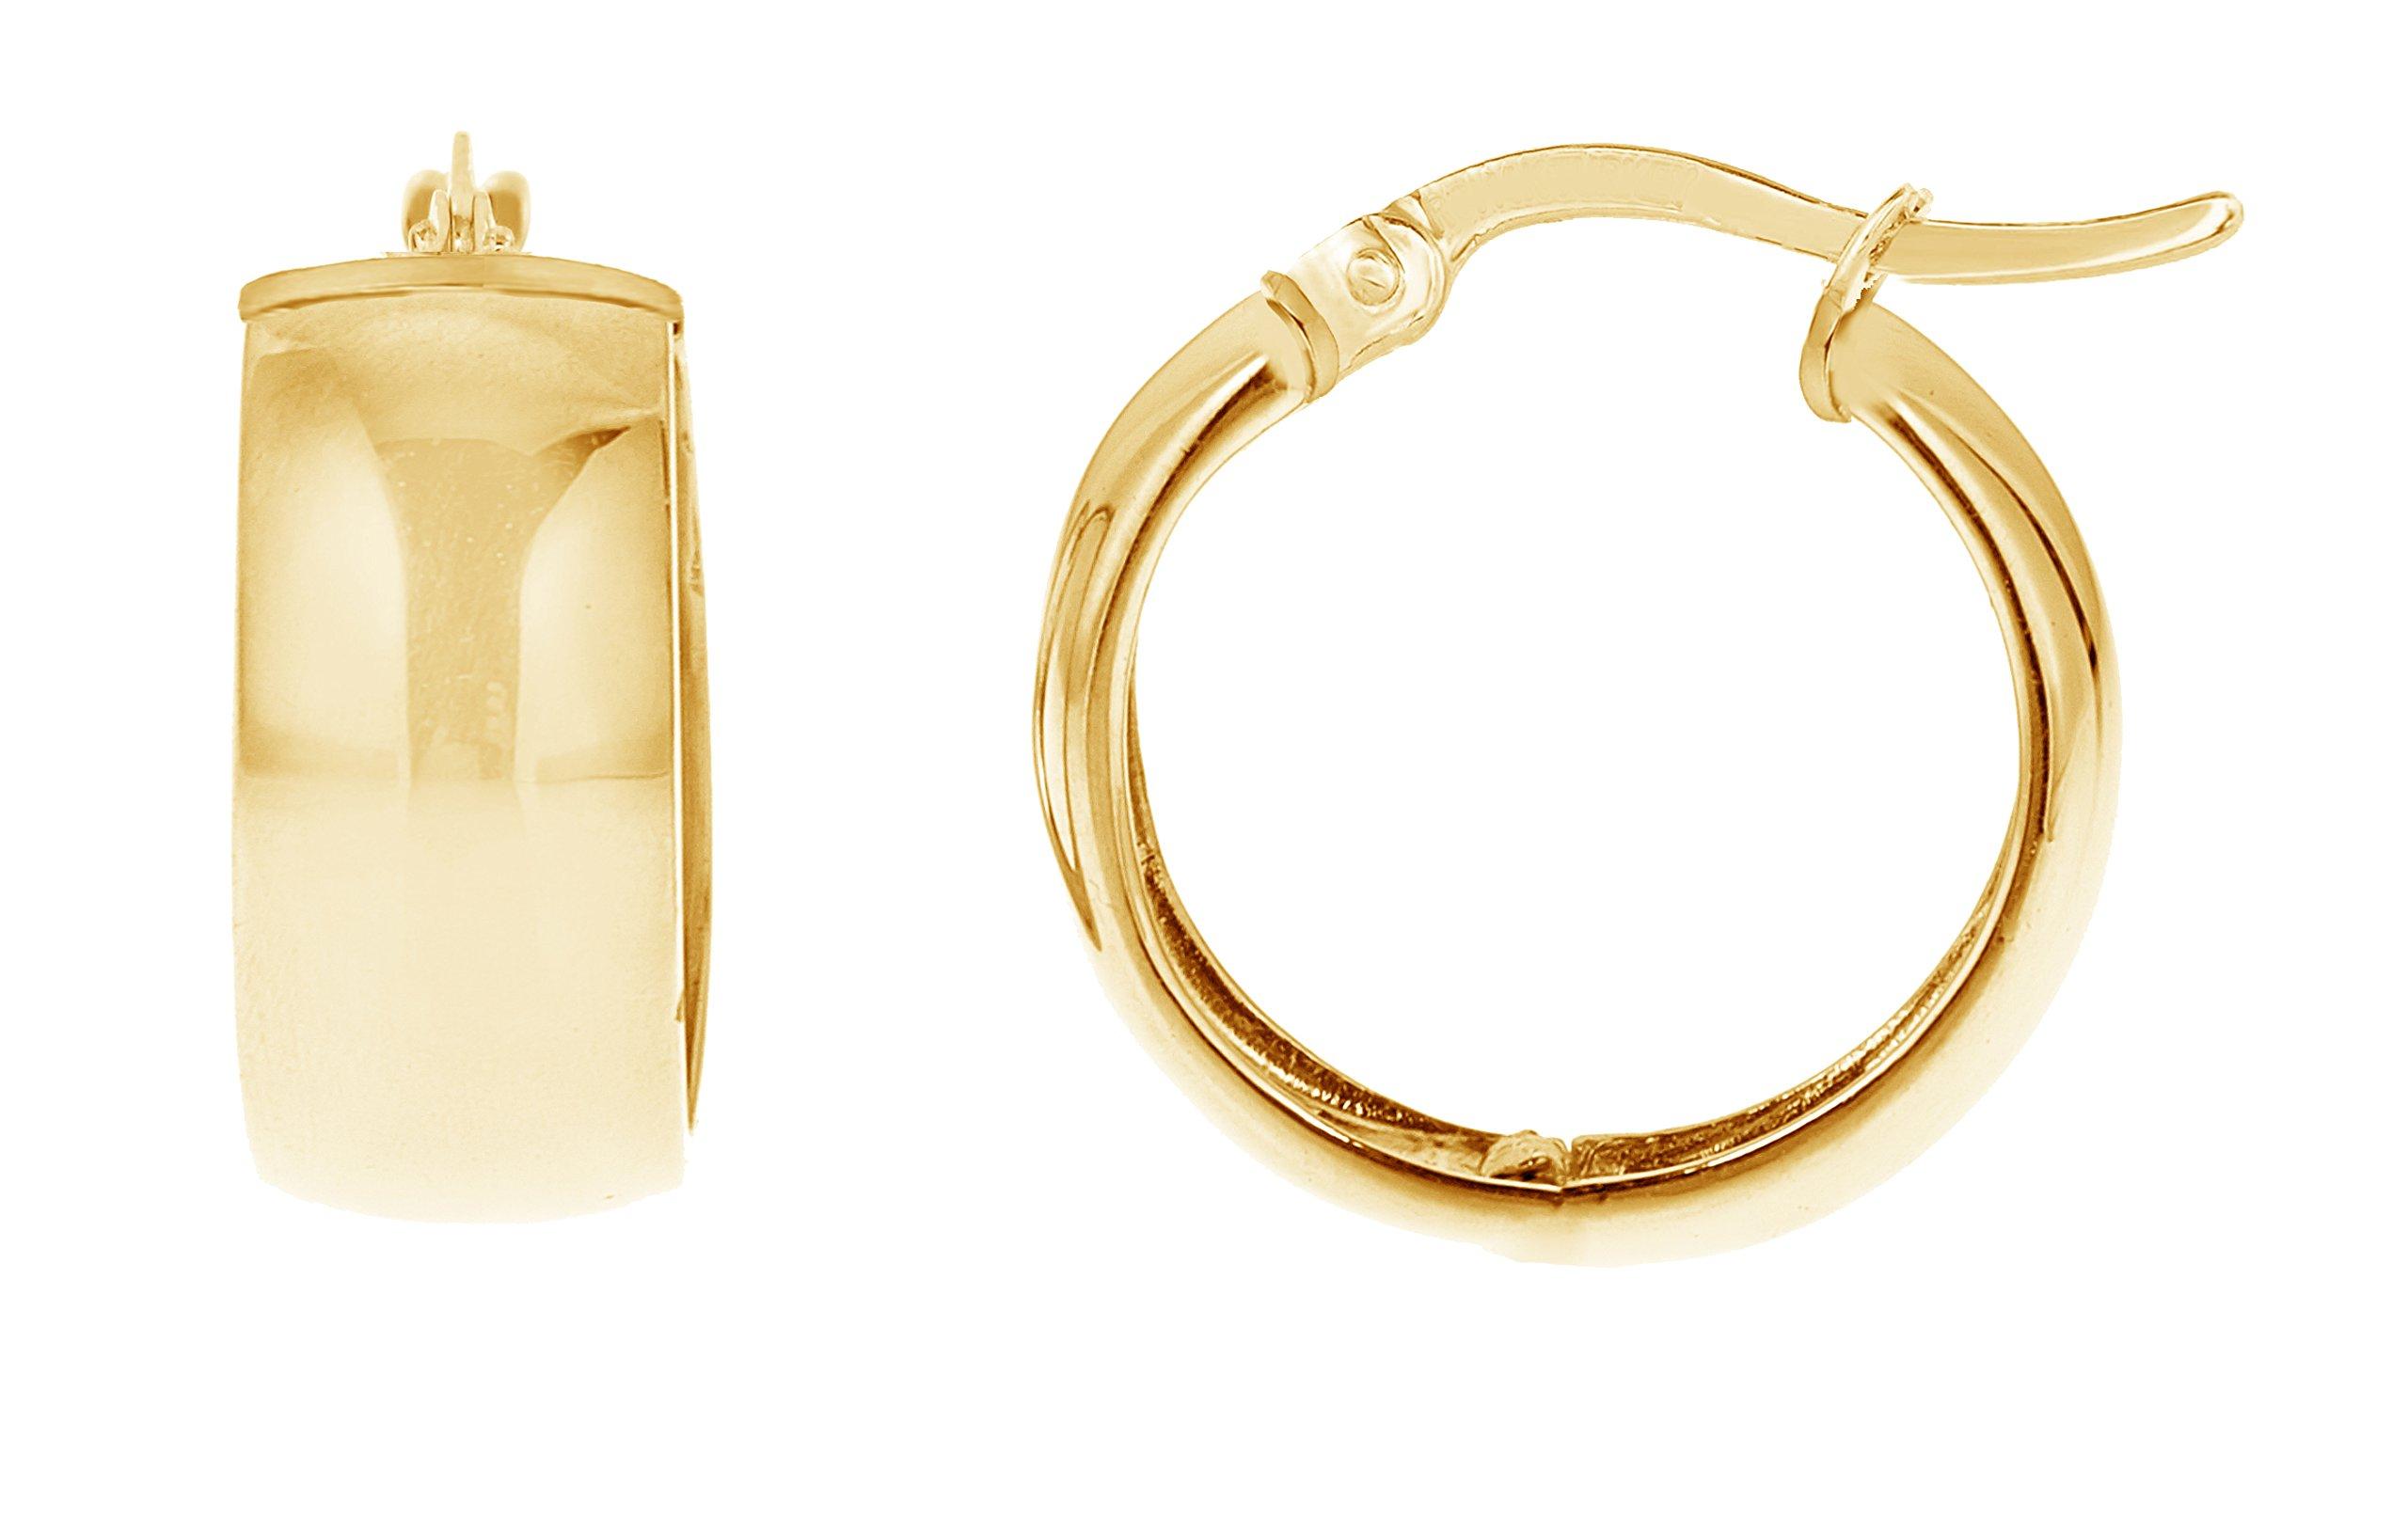 14k Yellow Gold Shiny Polished Wide Huggies Hoop Earrings 6x13.5 Mm (yellow-gold)